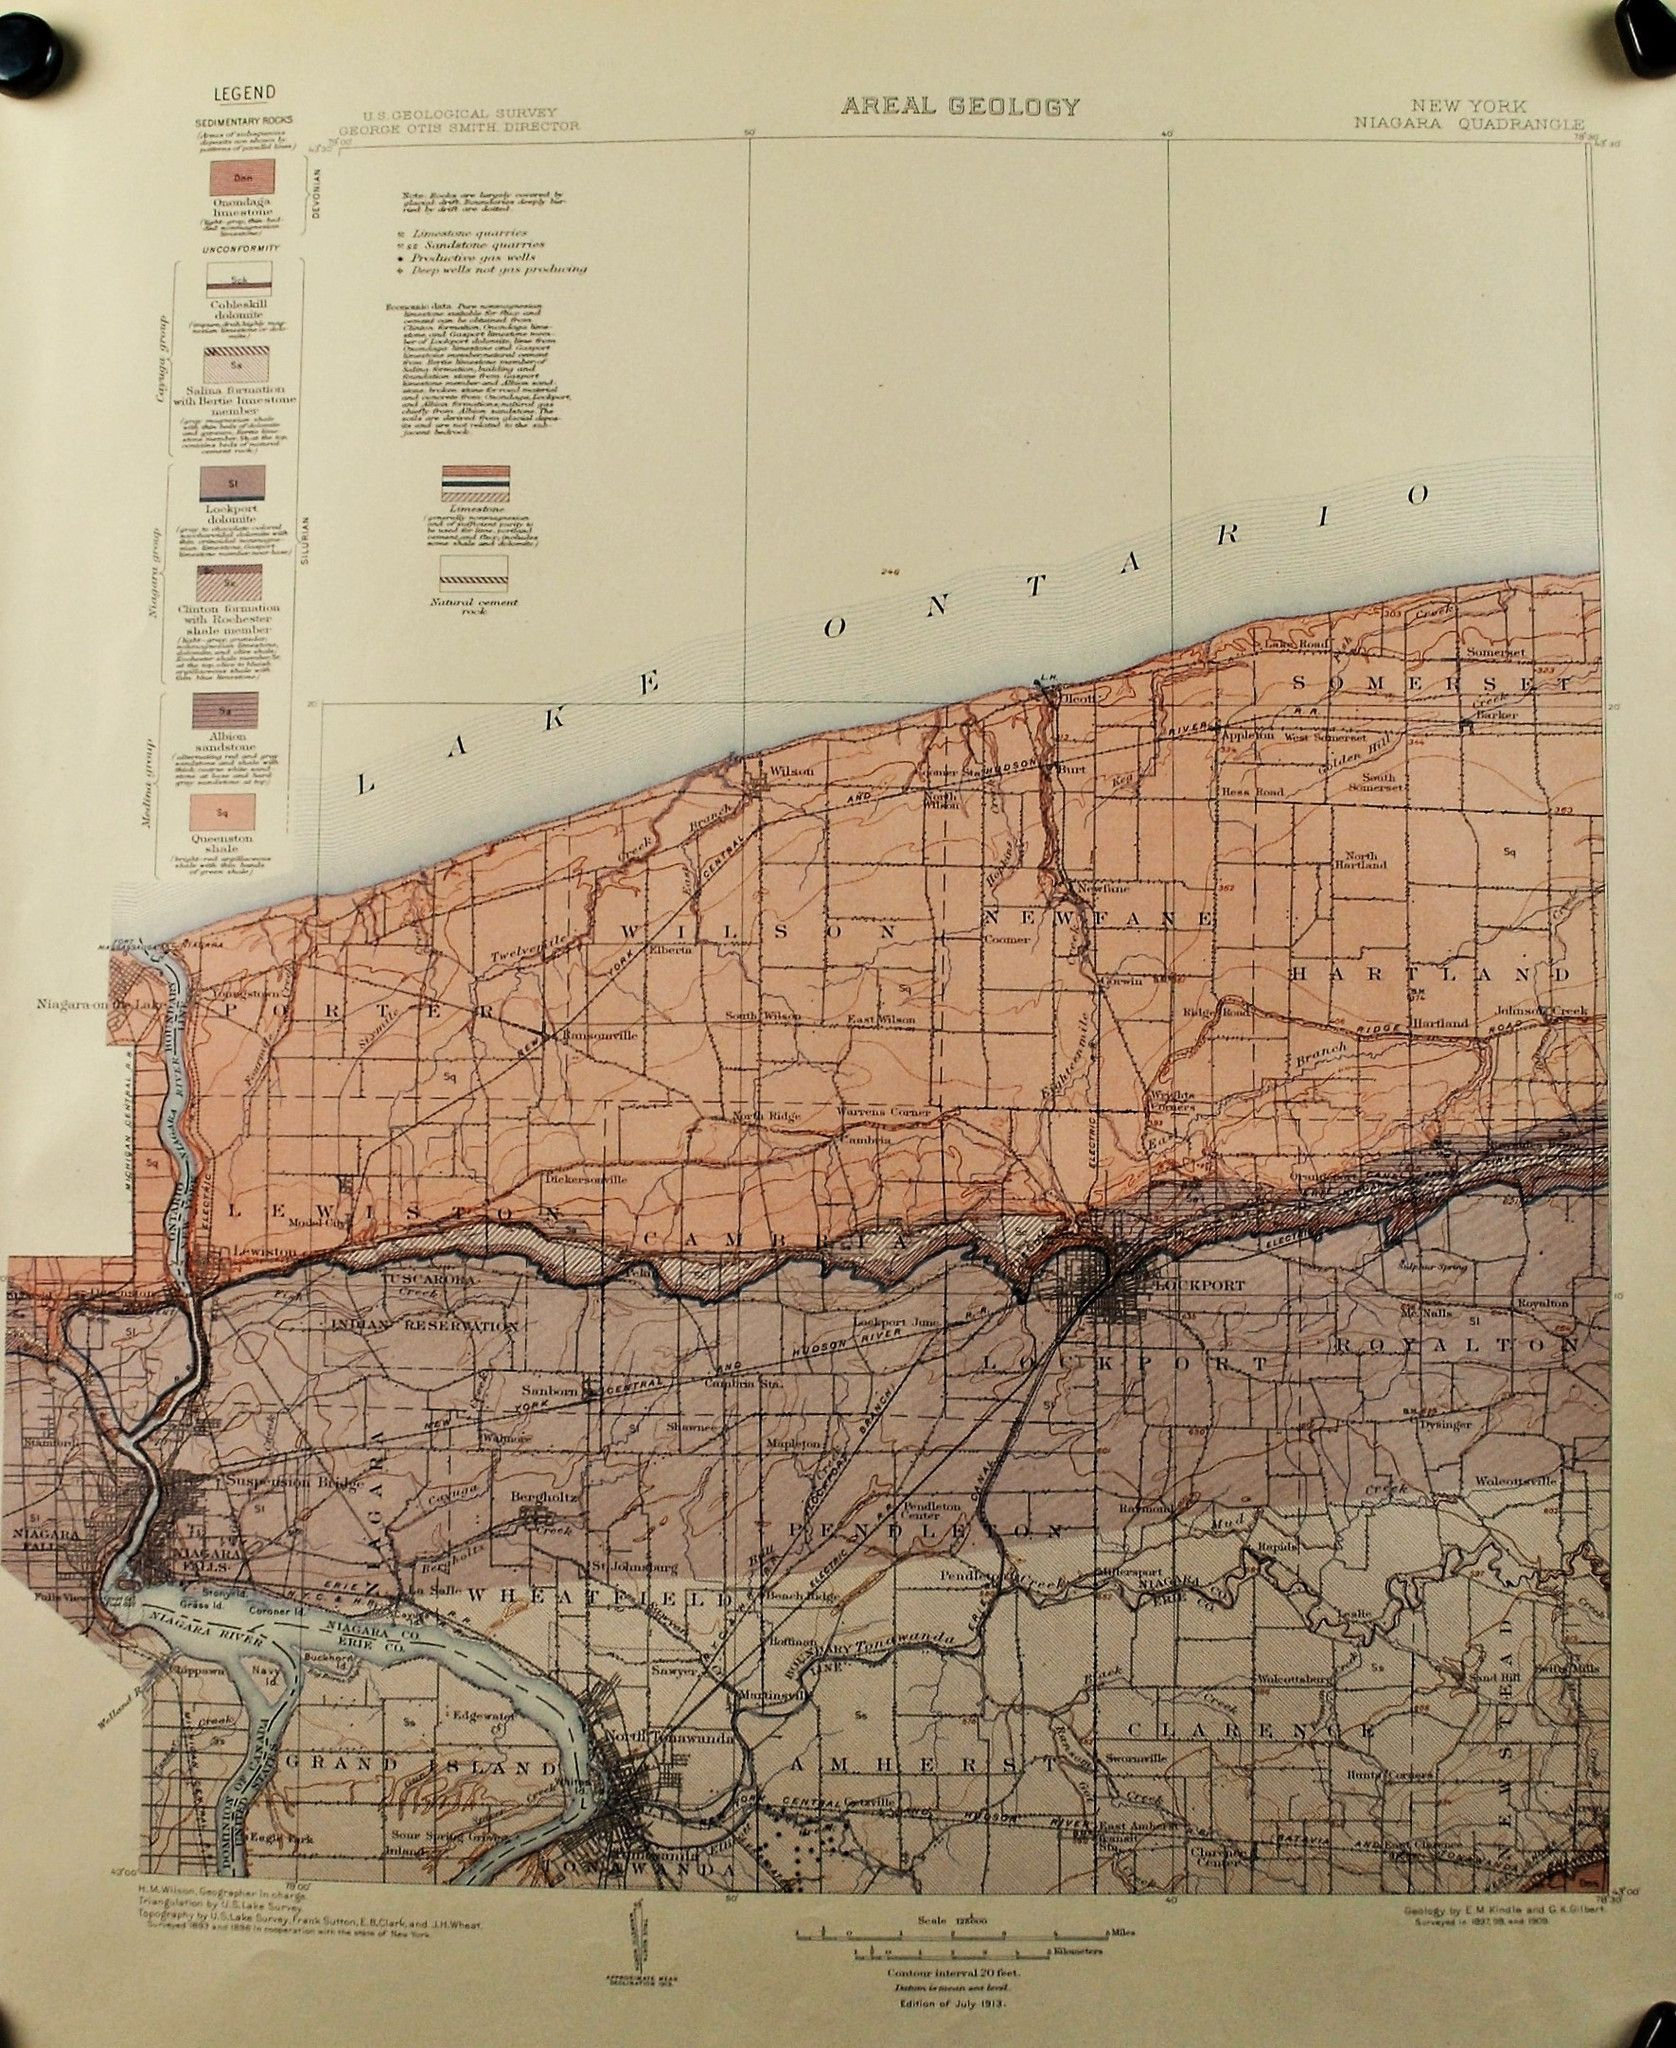 us geological survey areal geology map of niagara county new york ( niagara falls).  us geological survey areal geology map of niagara county